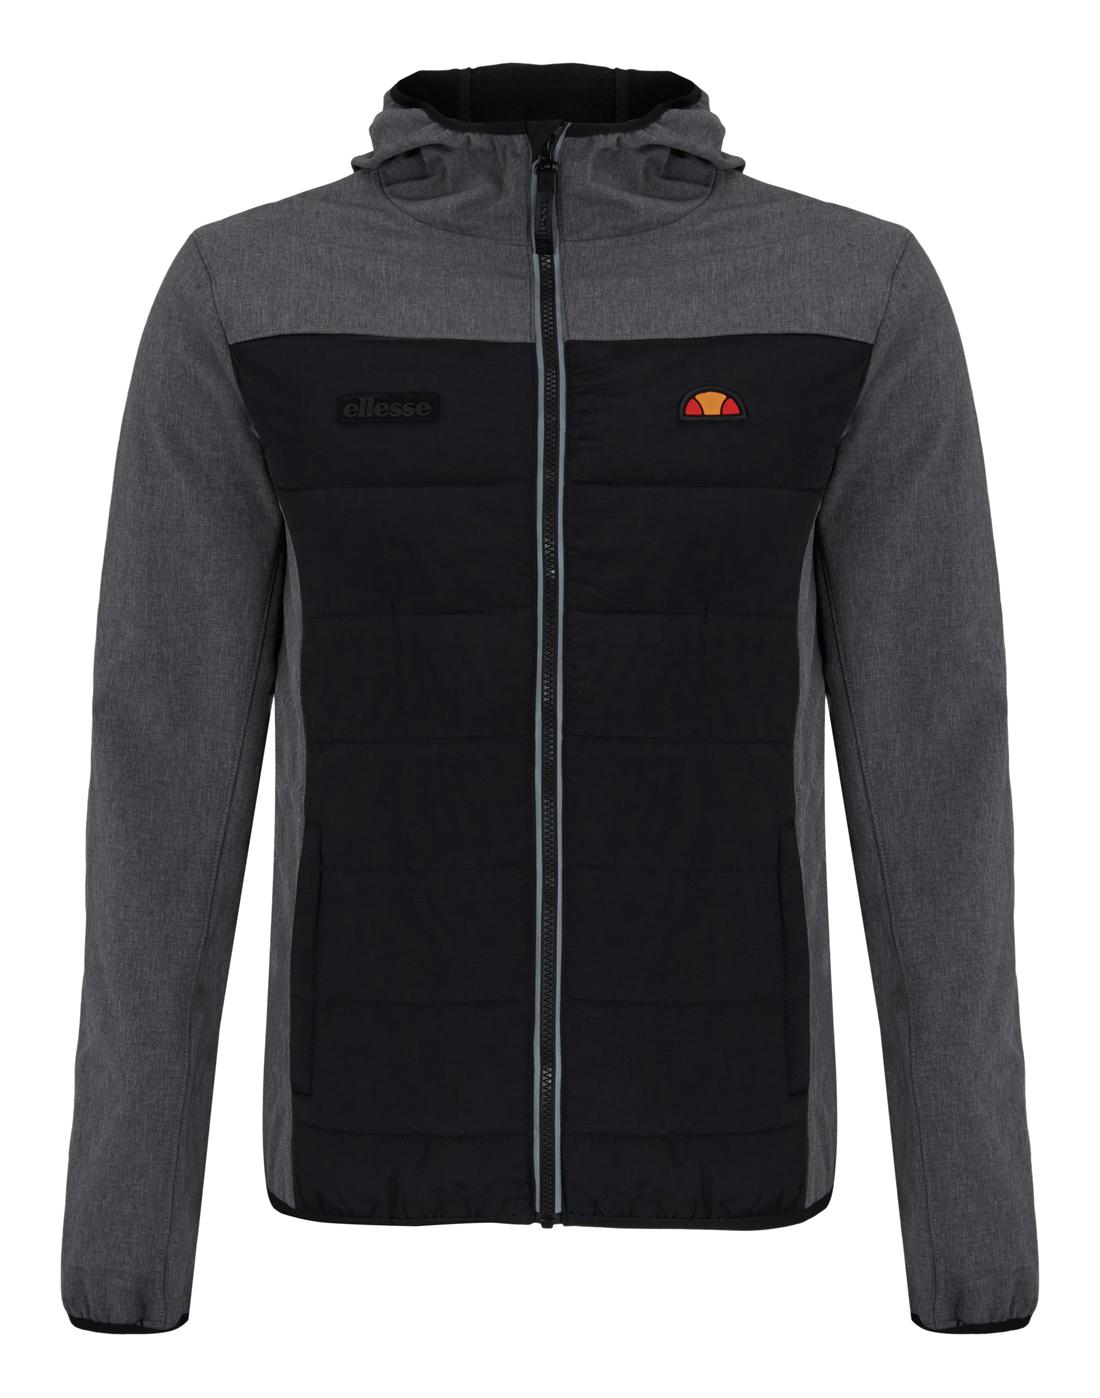 d6e4f856a4 Ellesse Mens Illuminate Jacket   Life Style Sports